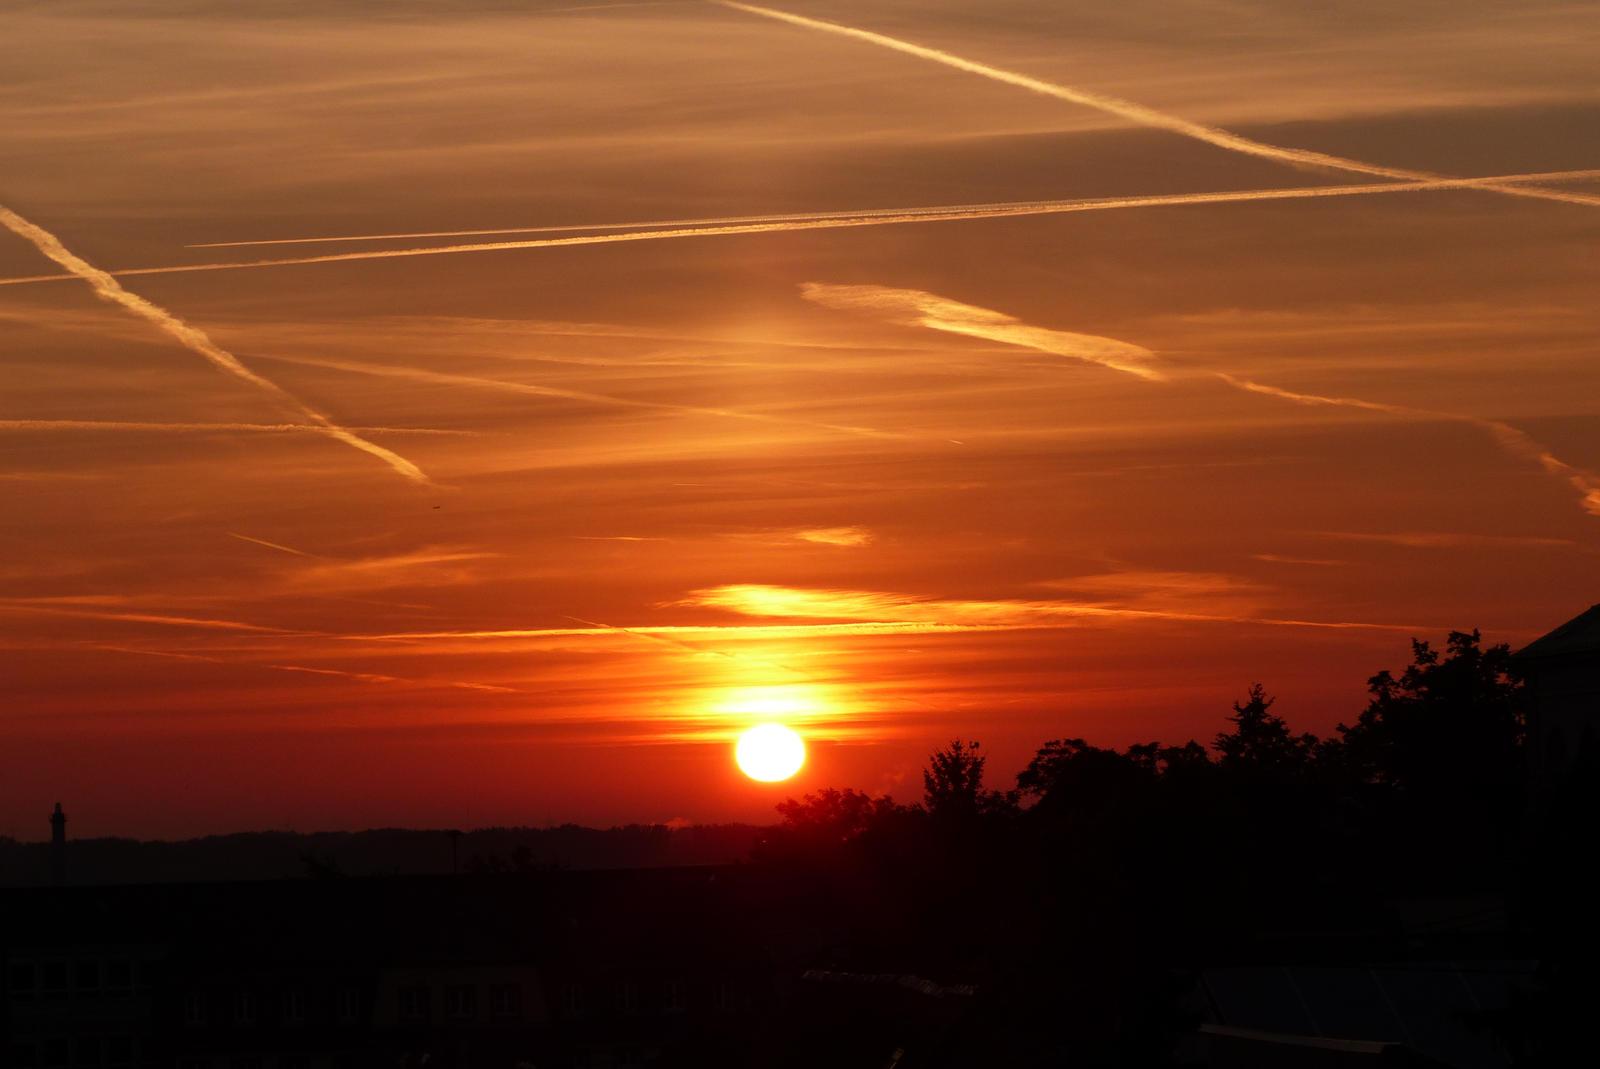 Sunrise by headstert